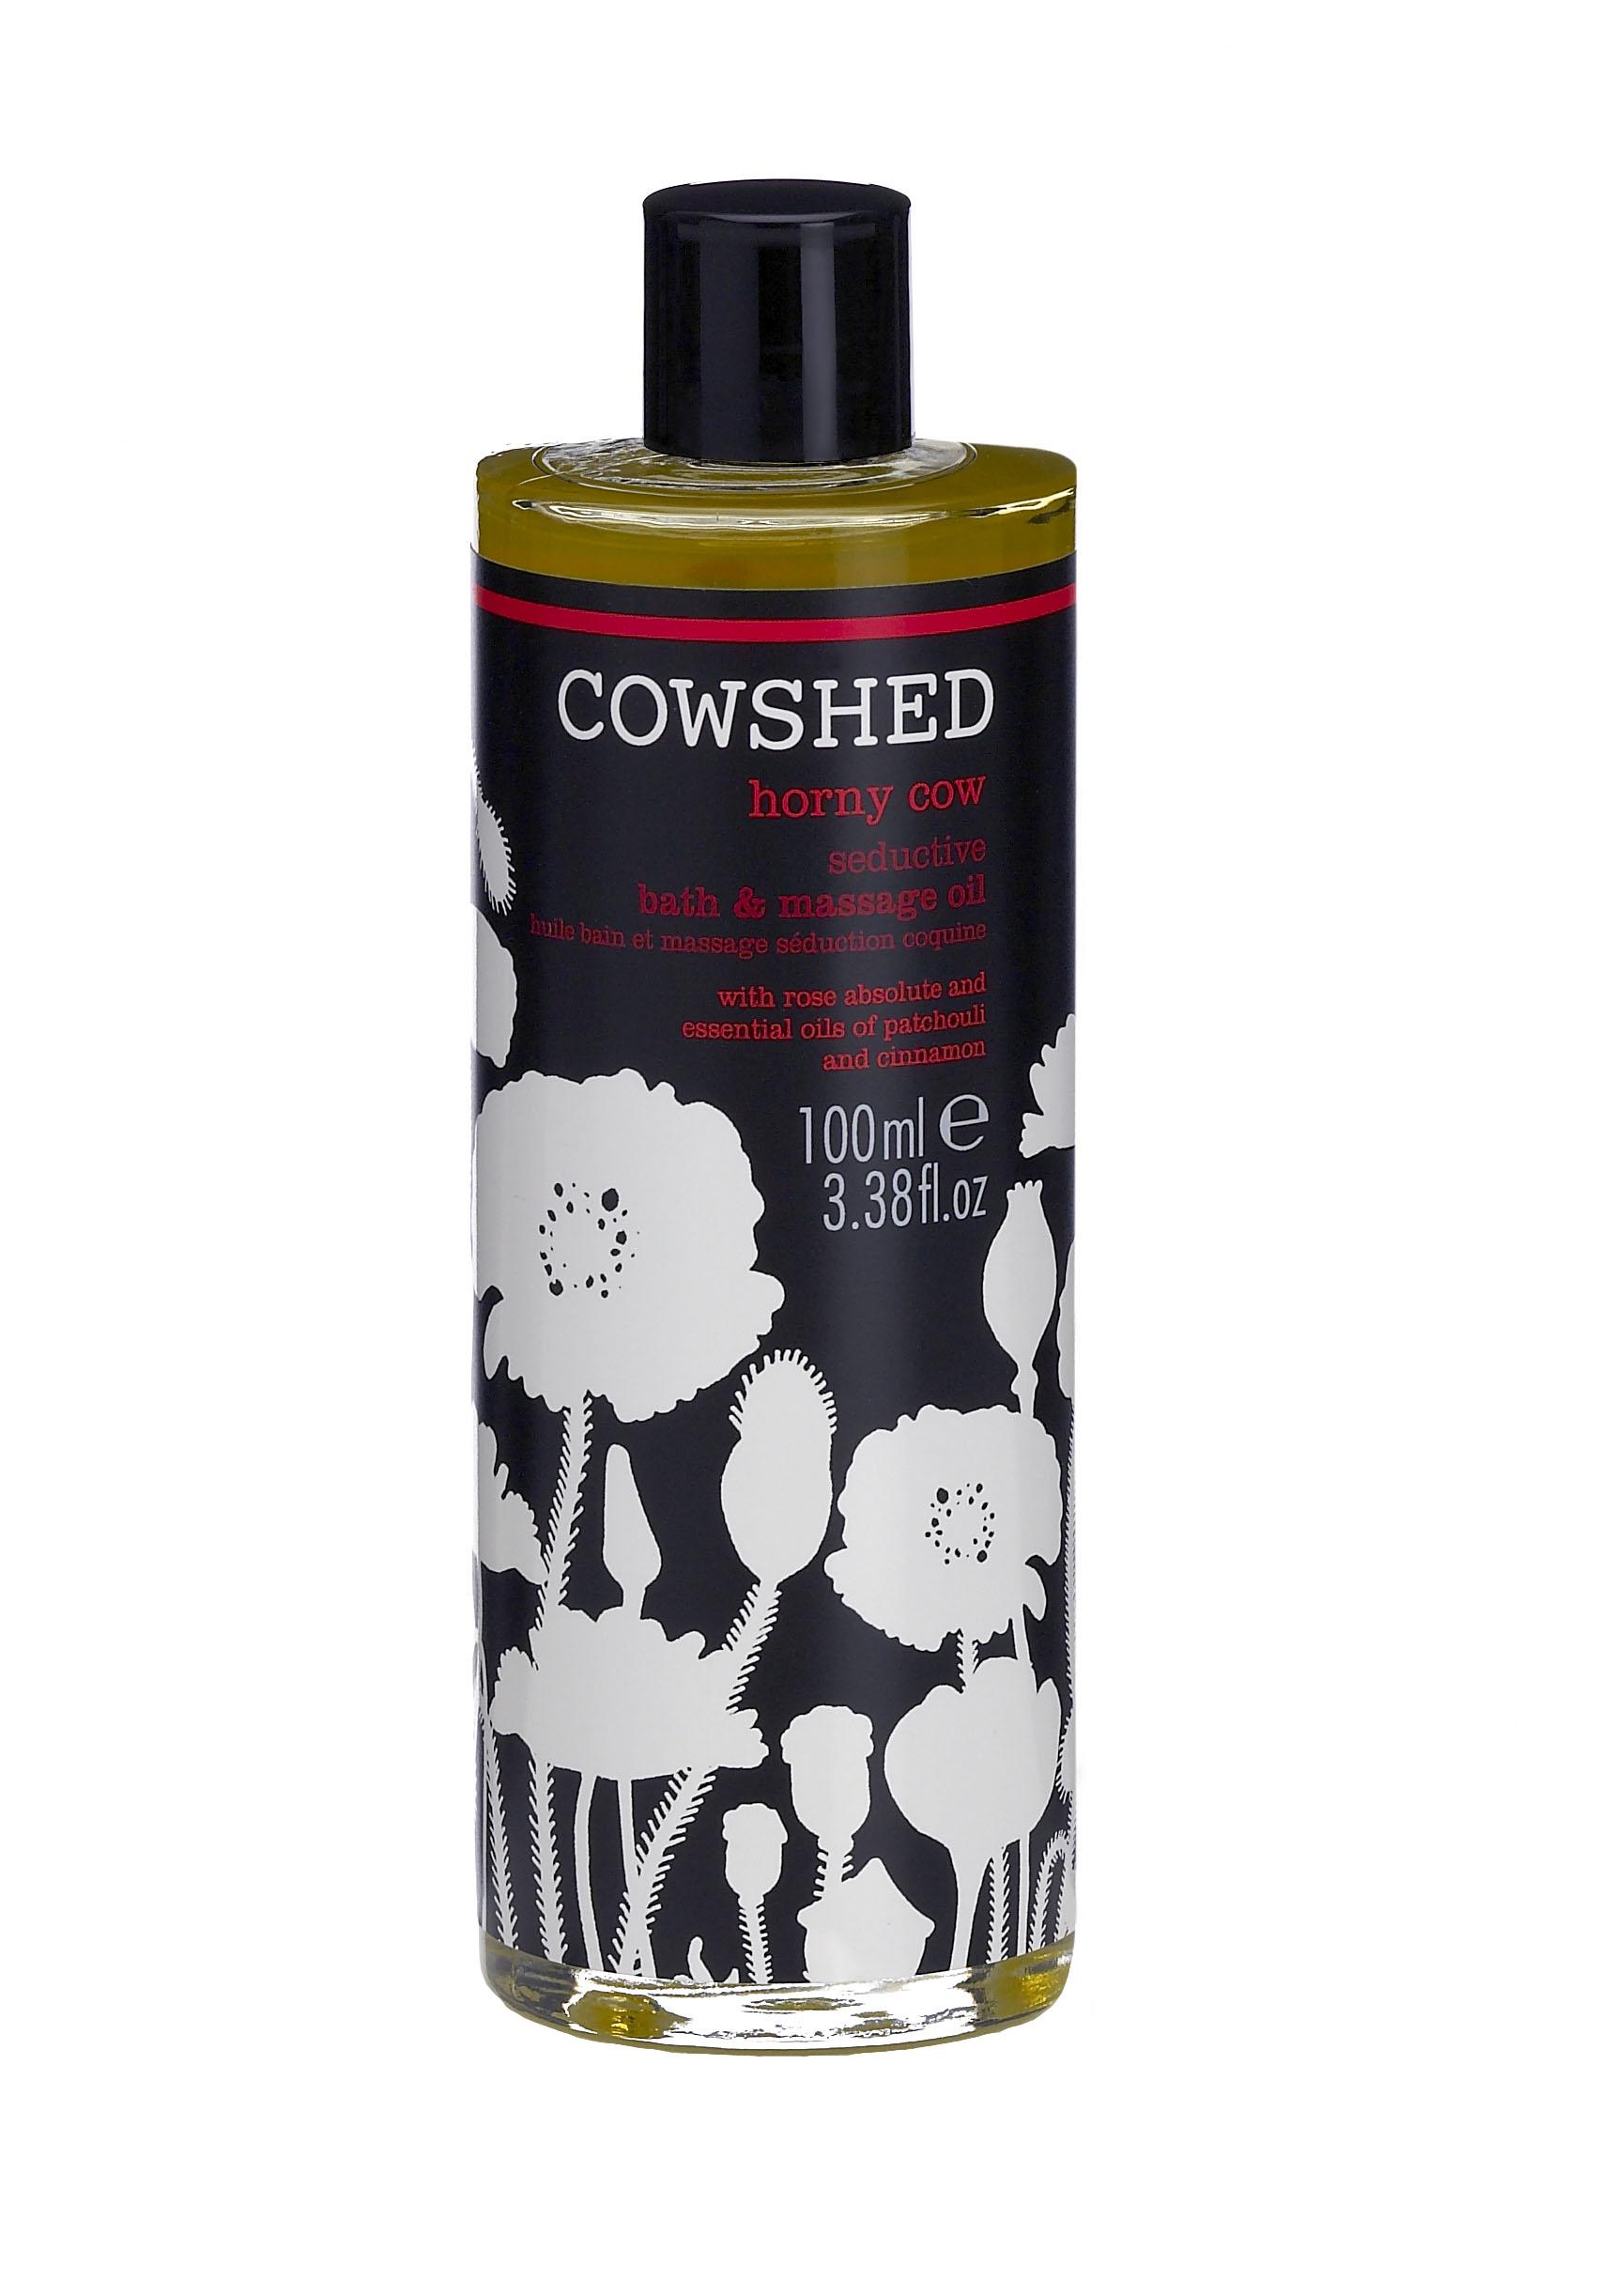 N/A – Cowshed horny cow seductive bath & massage oil 100 ml. på spashop.dk